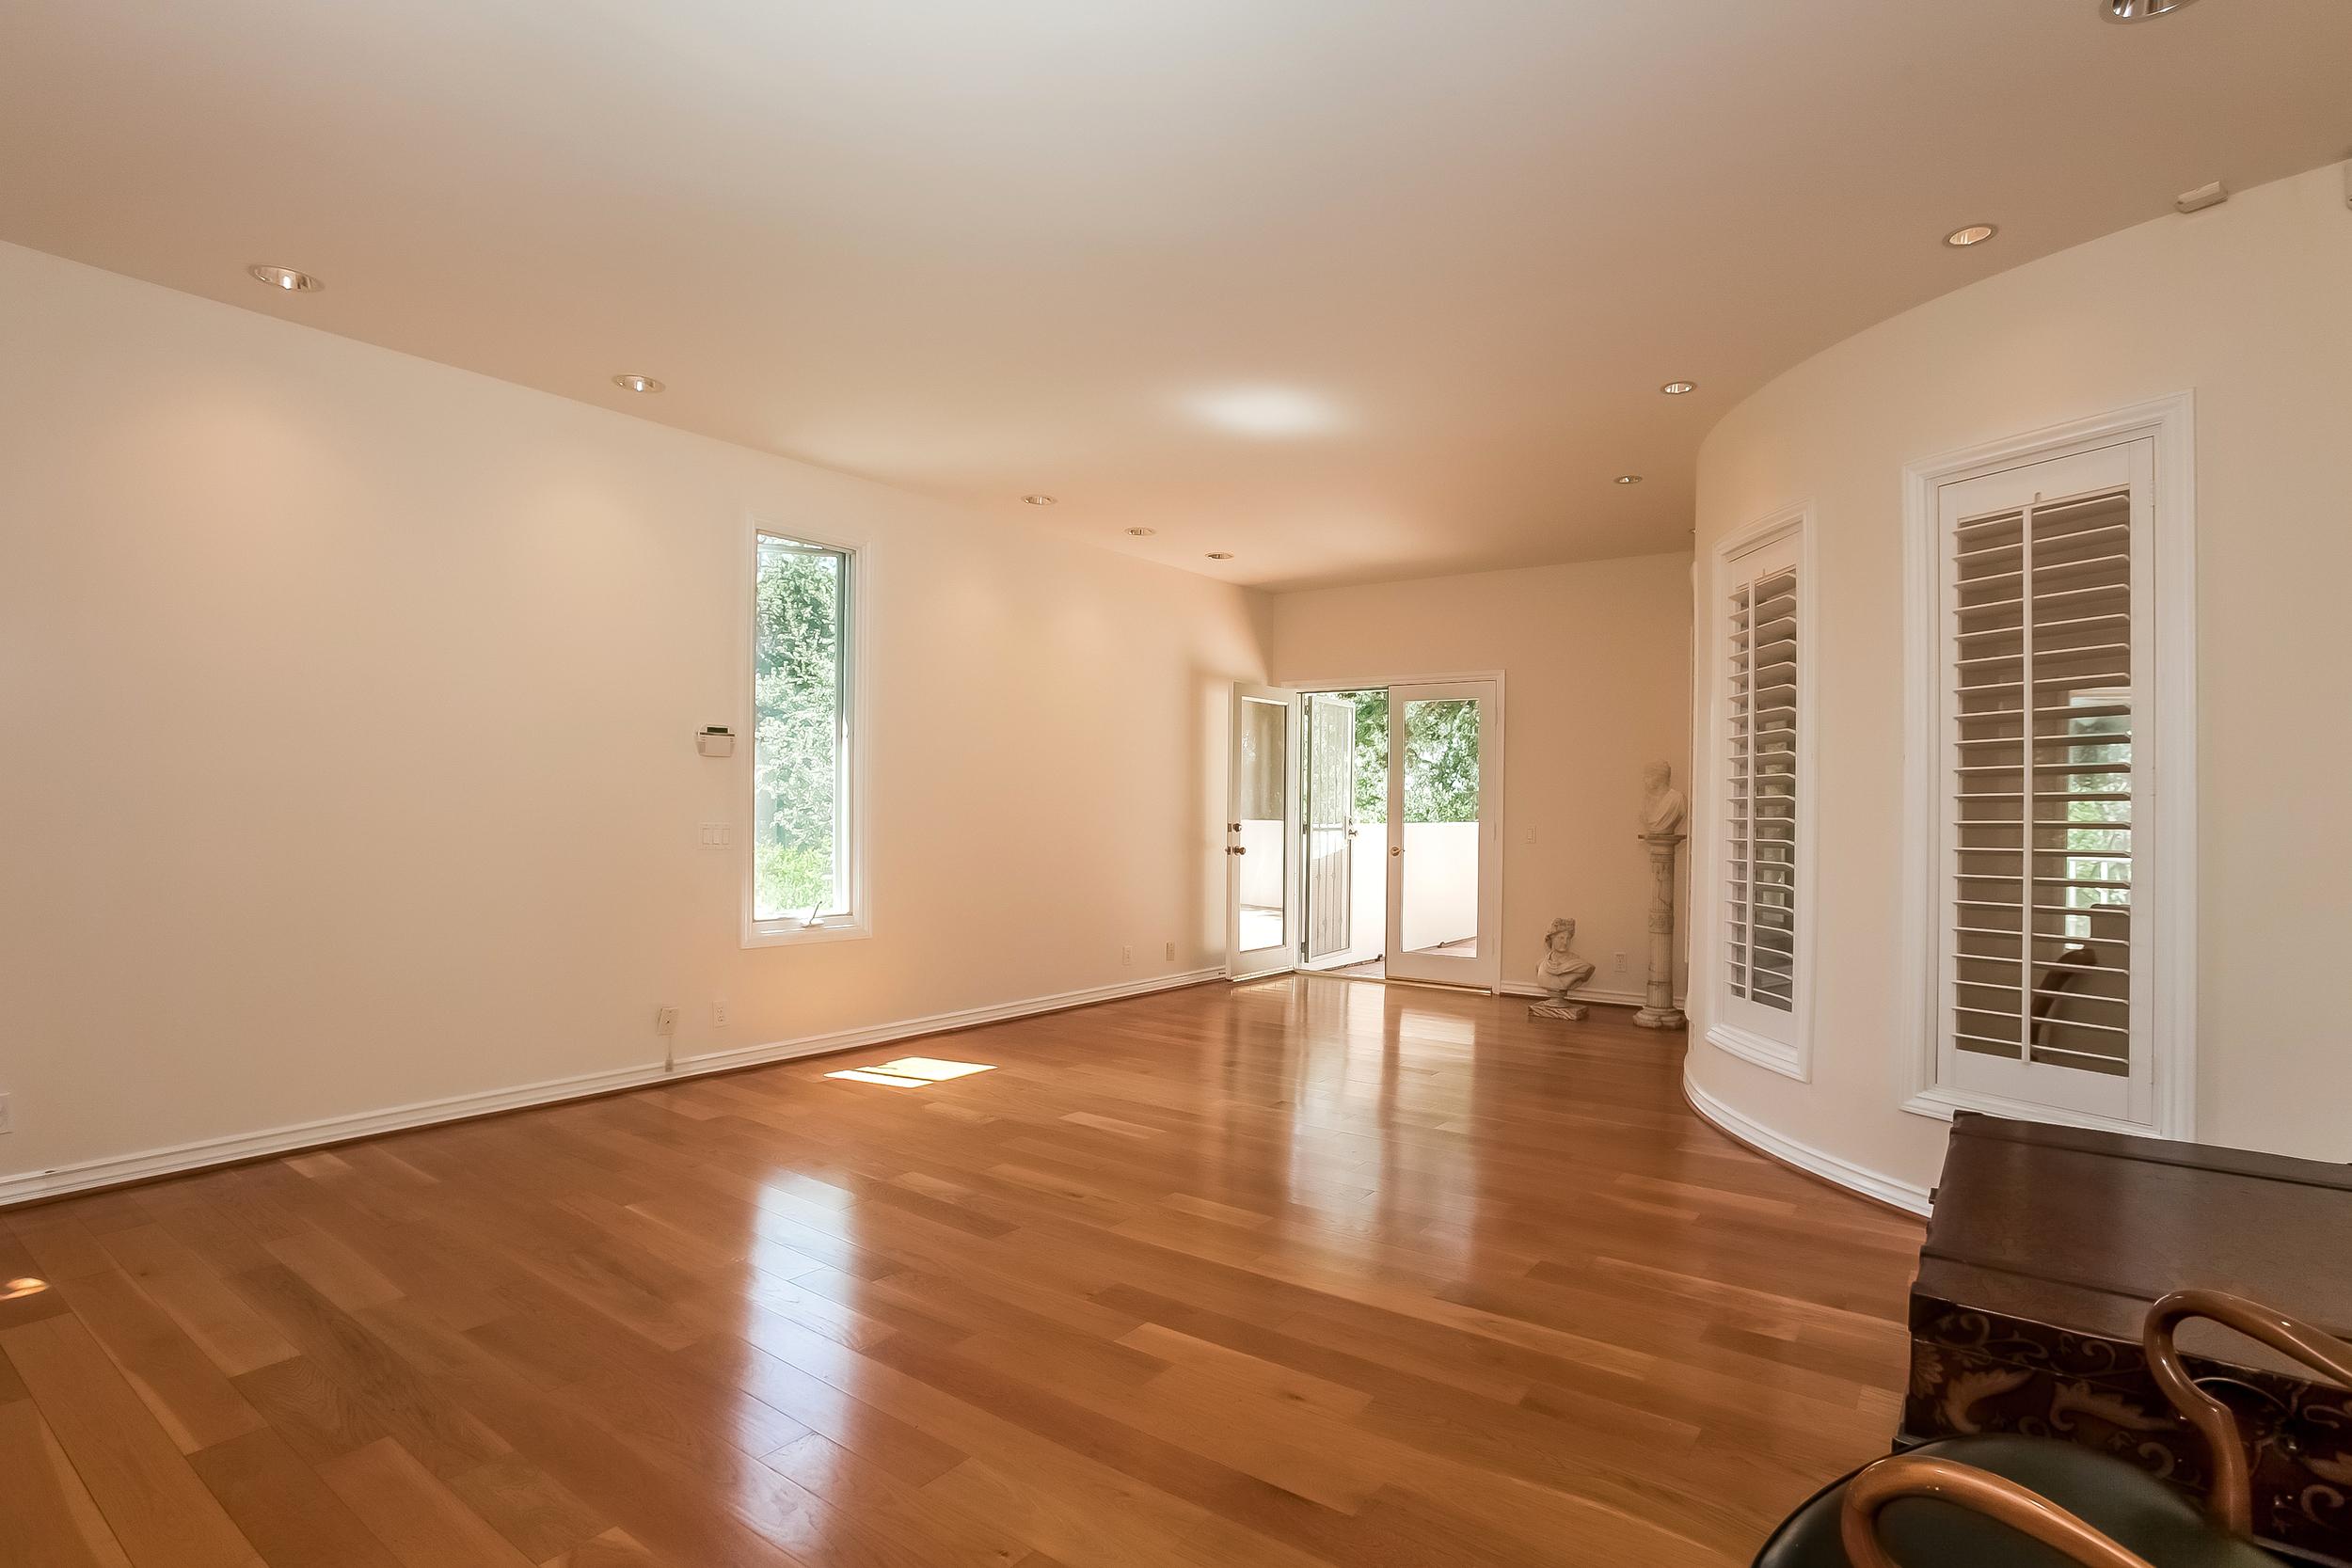 022-Master_Bedroom-2804440-large.jpg